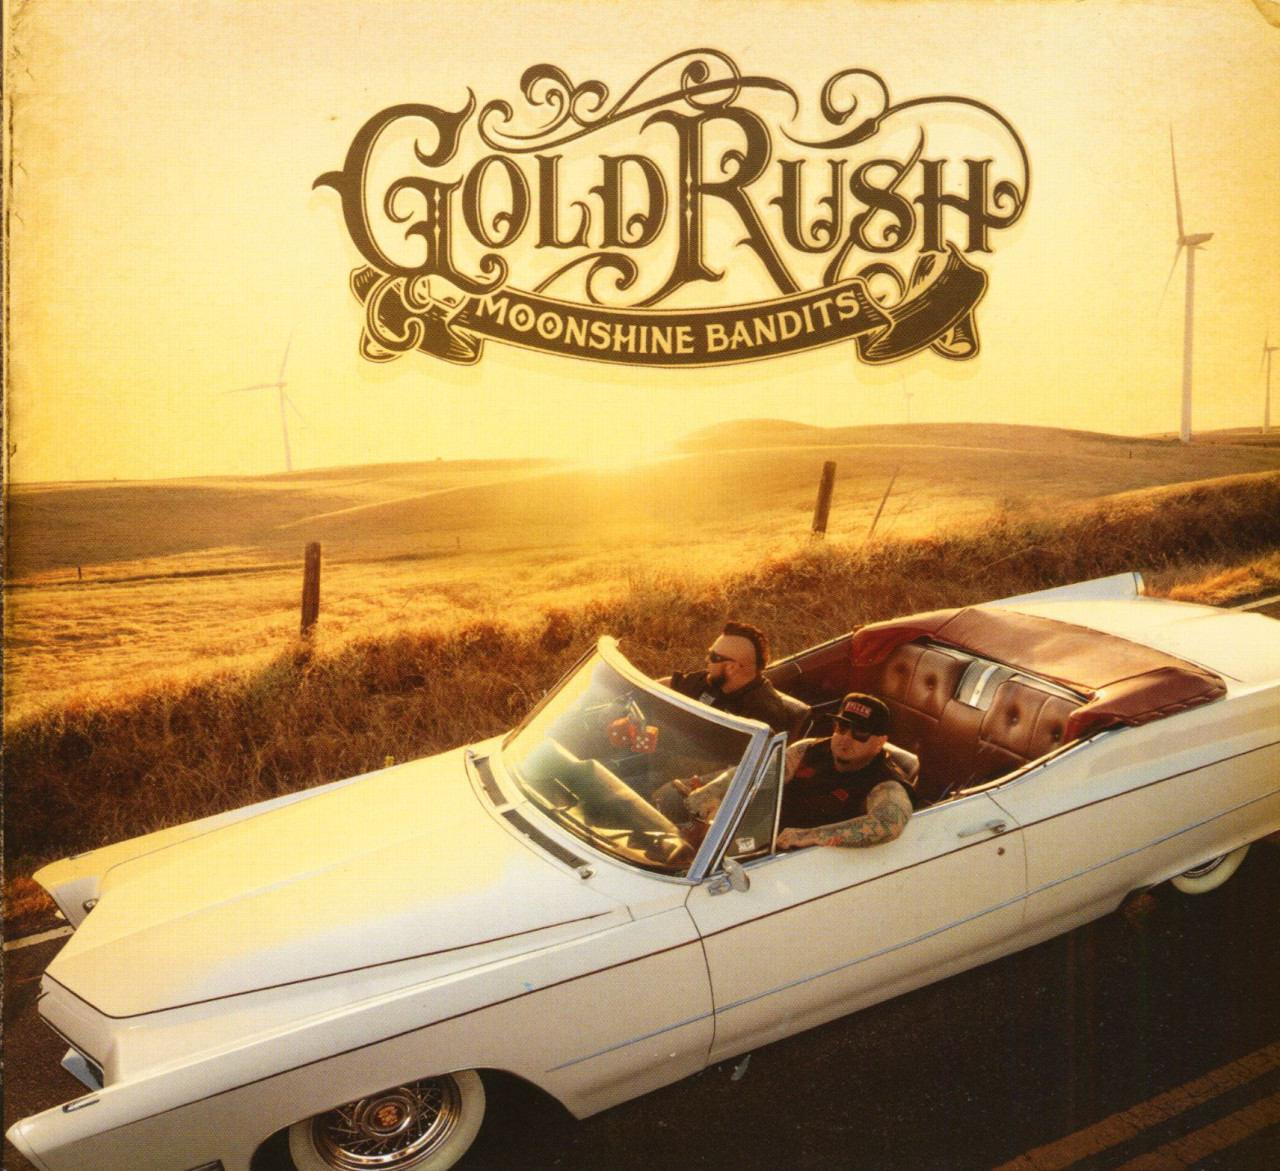 Moonshine Bandits - Gold Rush (CD)